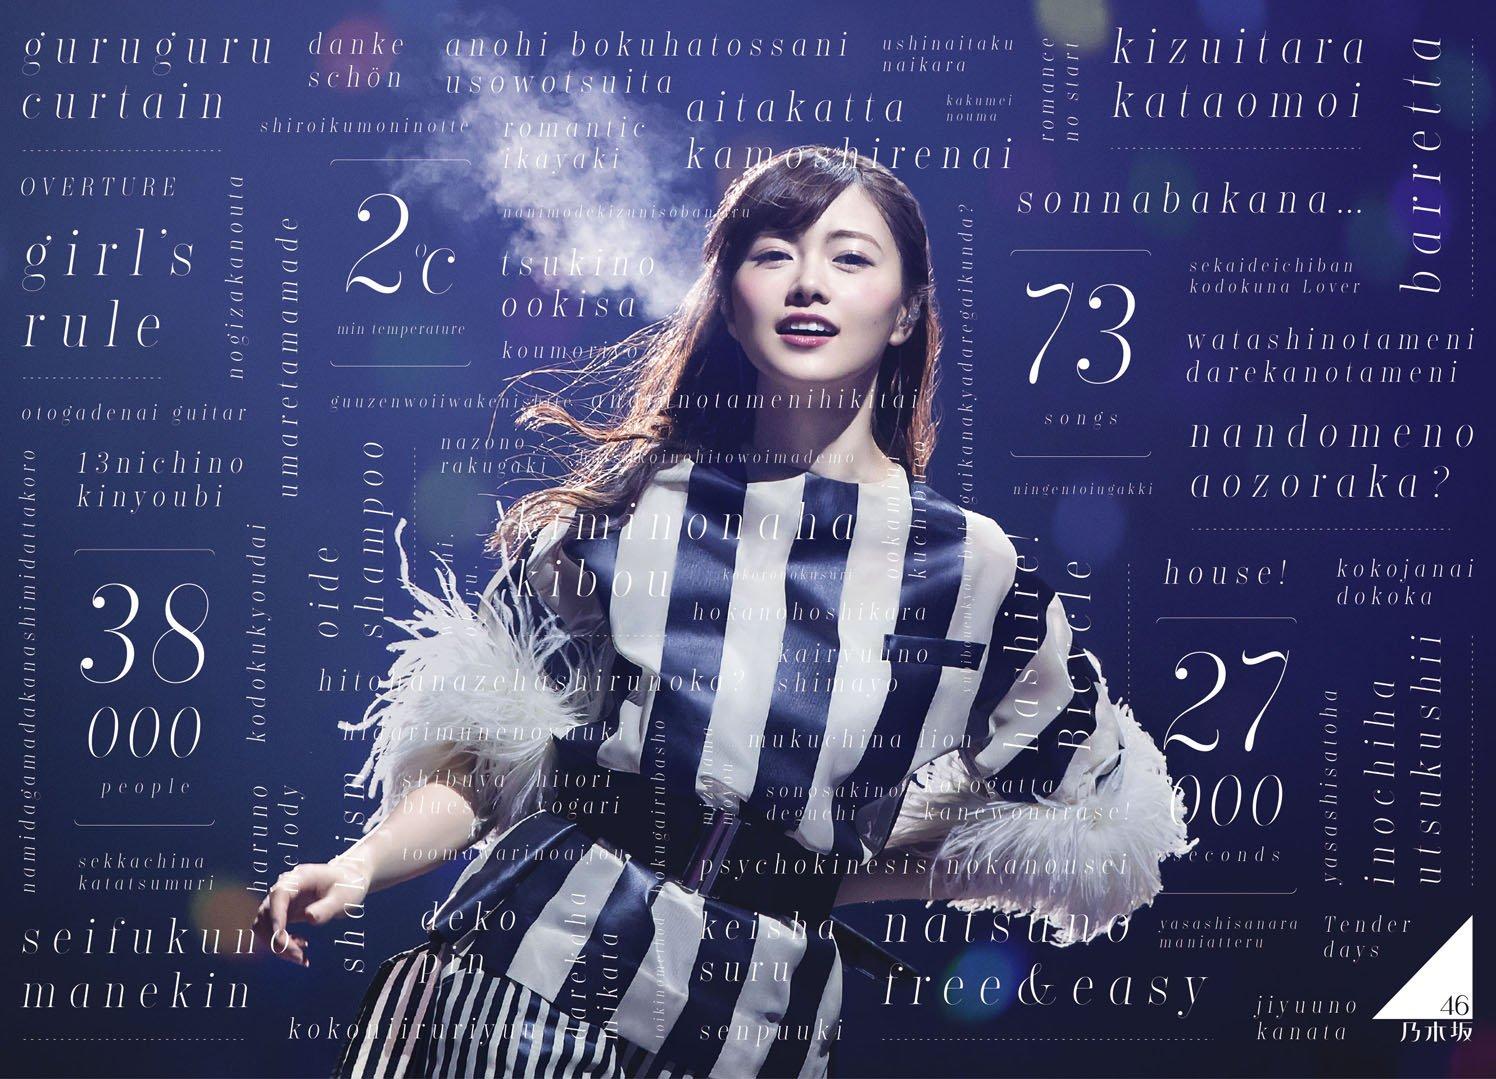 Nogizaka46 (乃木坂46) – Nogizaka46 3rd YEAR BIRTHDAY LIVE 2015.2.22 SEIBU DOME (LIMITED) 2016 Bluray 1080p